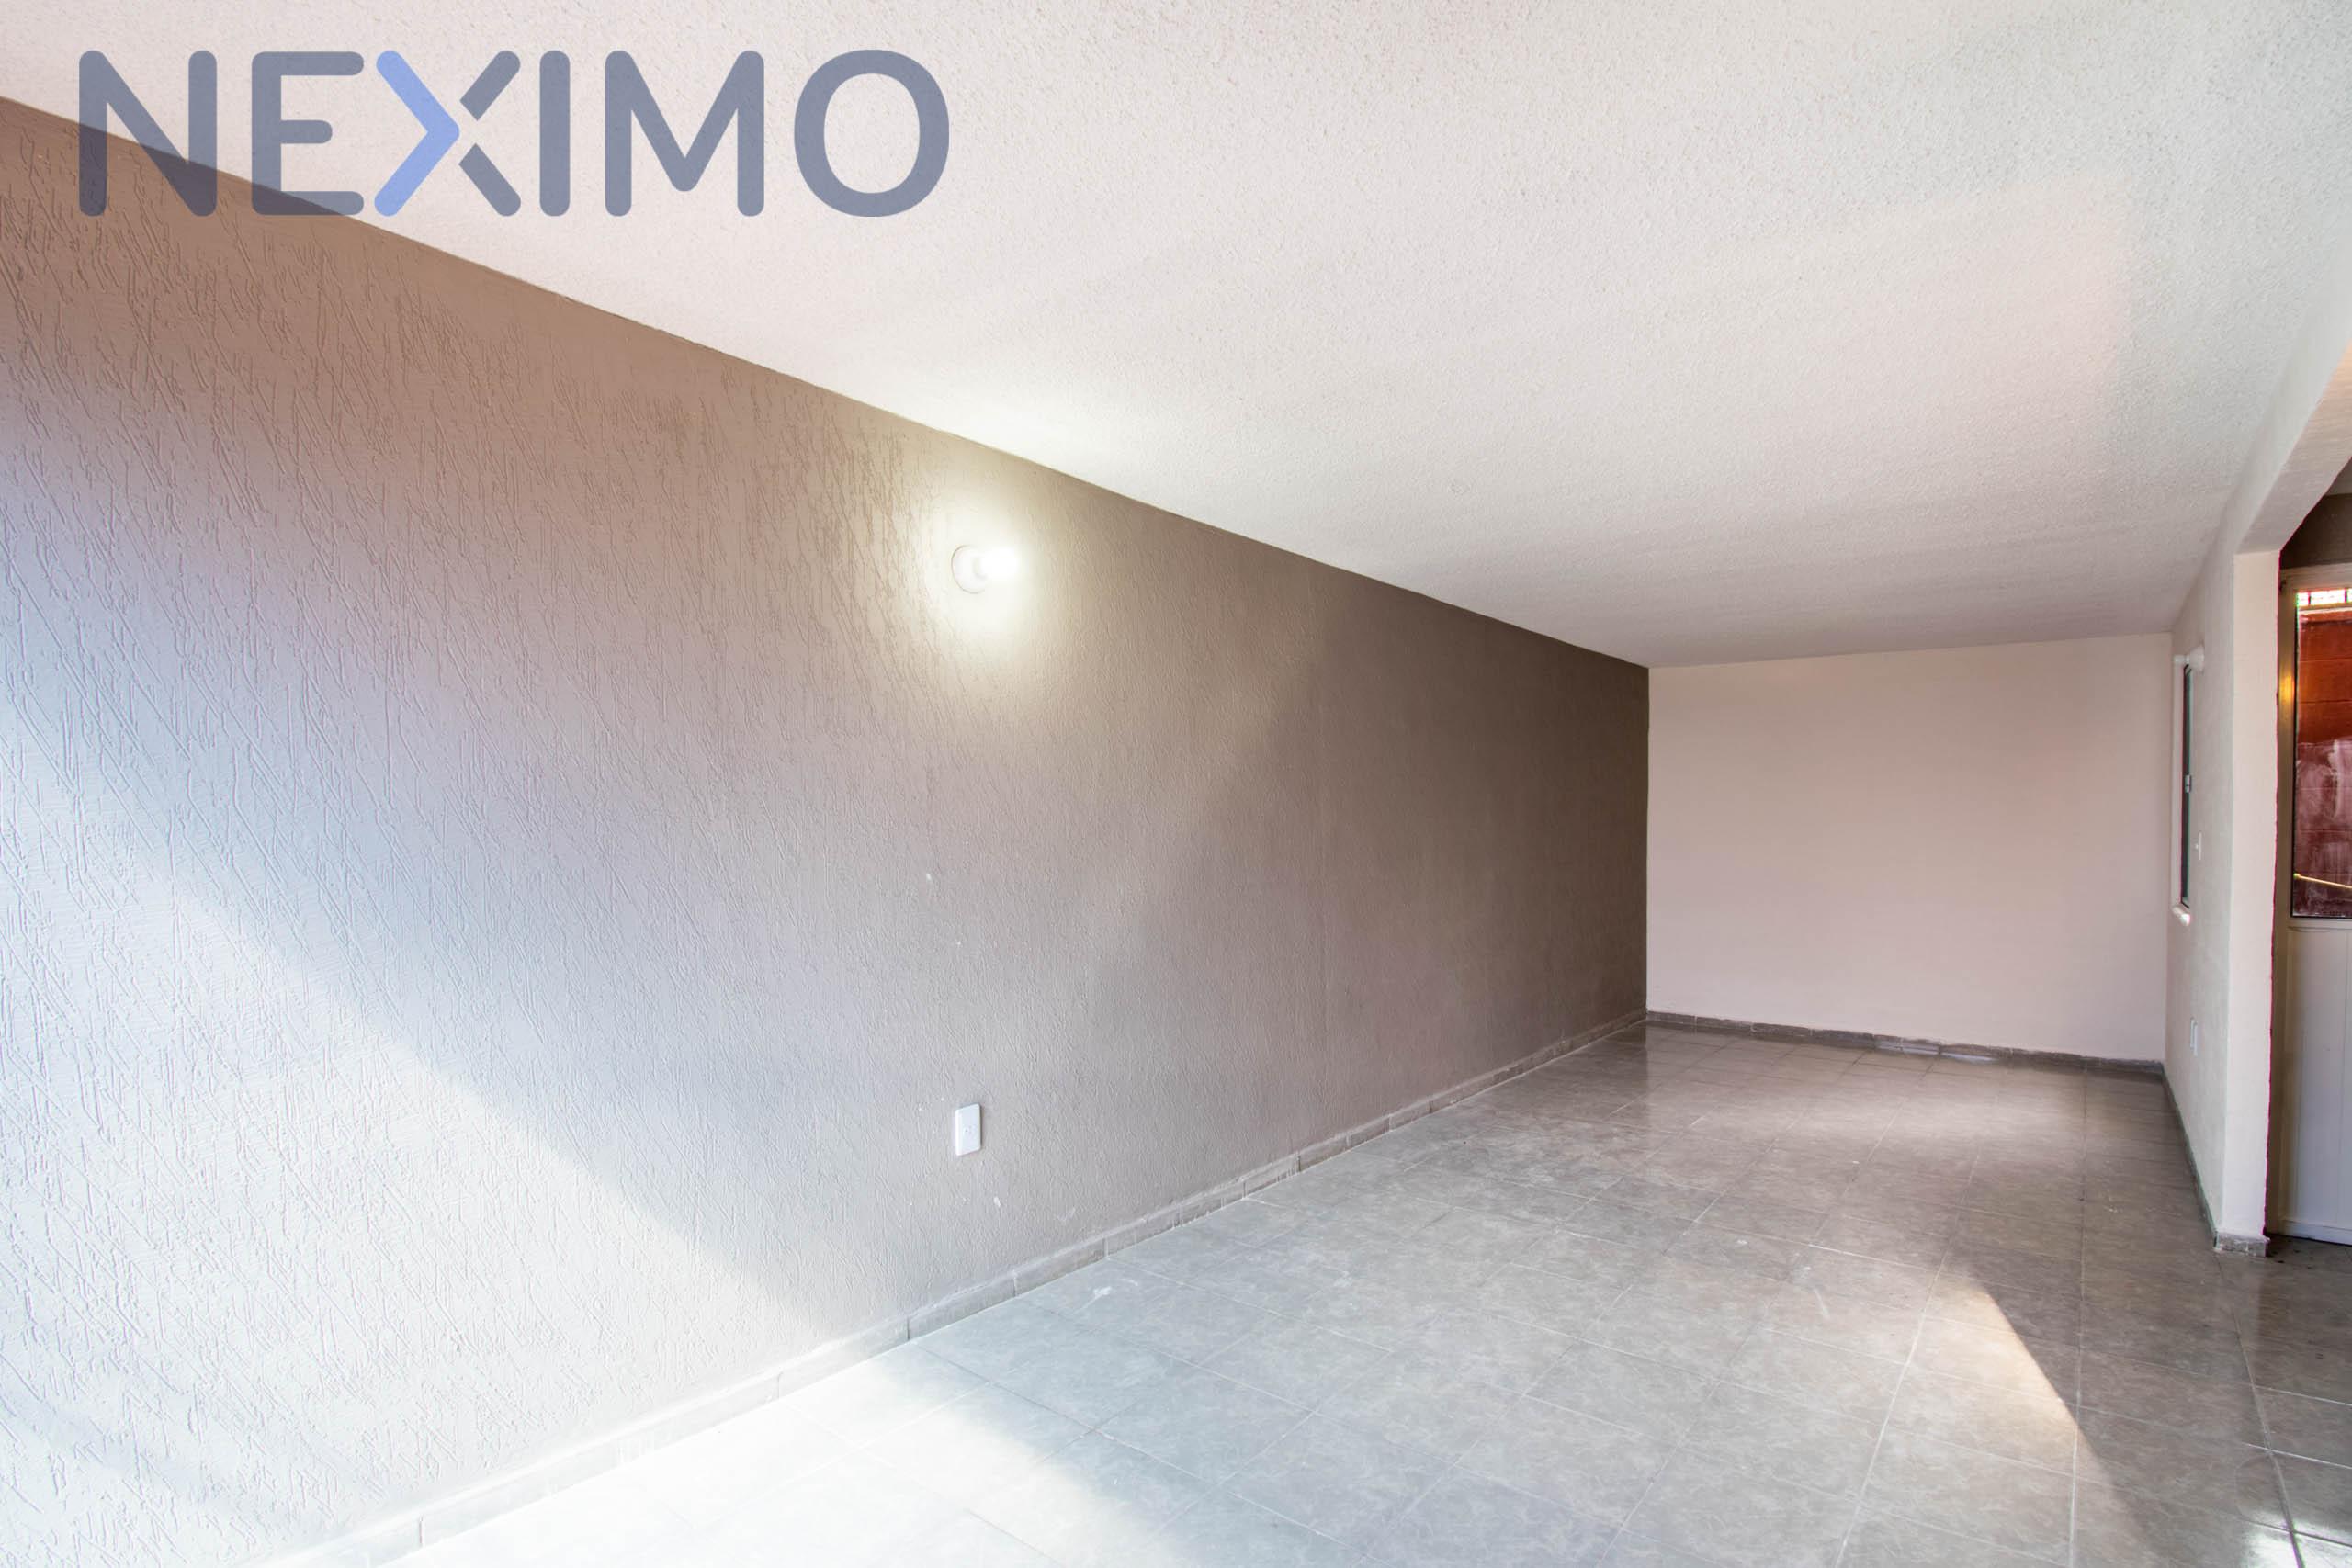 Se vende bonita casa totalmente remodelada en Rancho La Palma, Coacalco